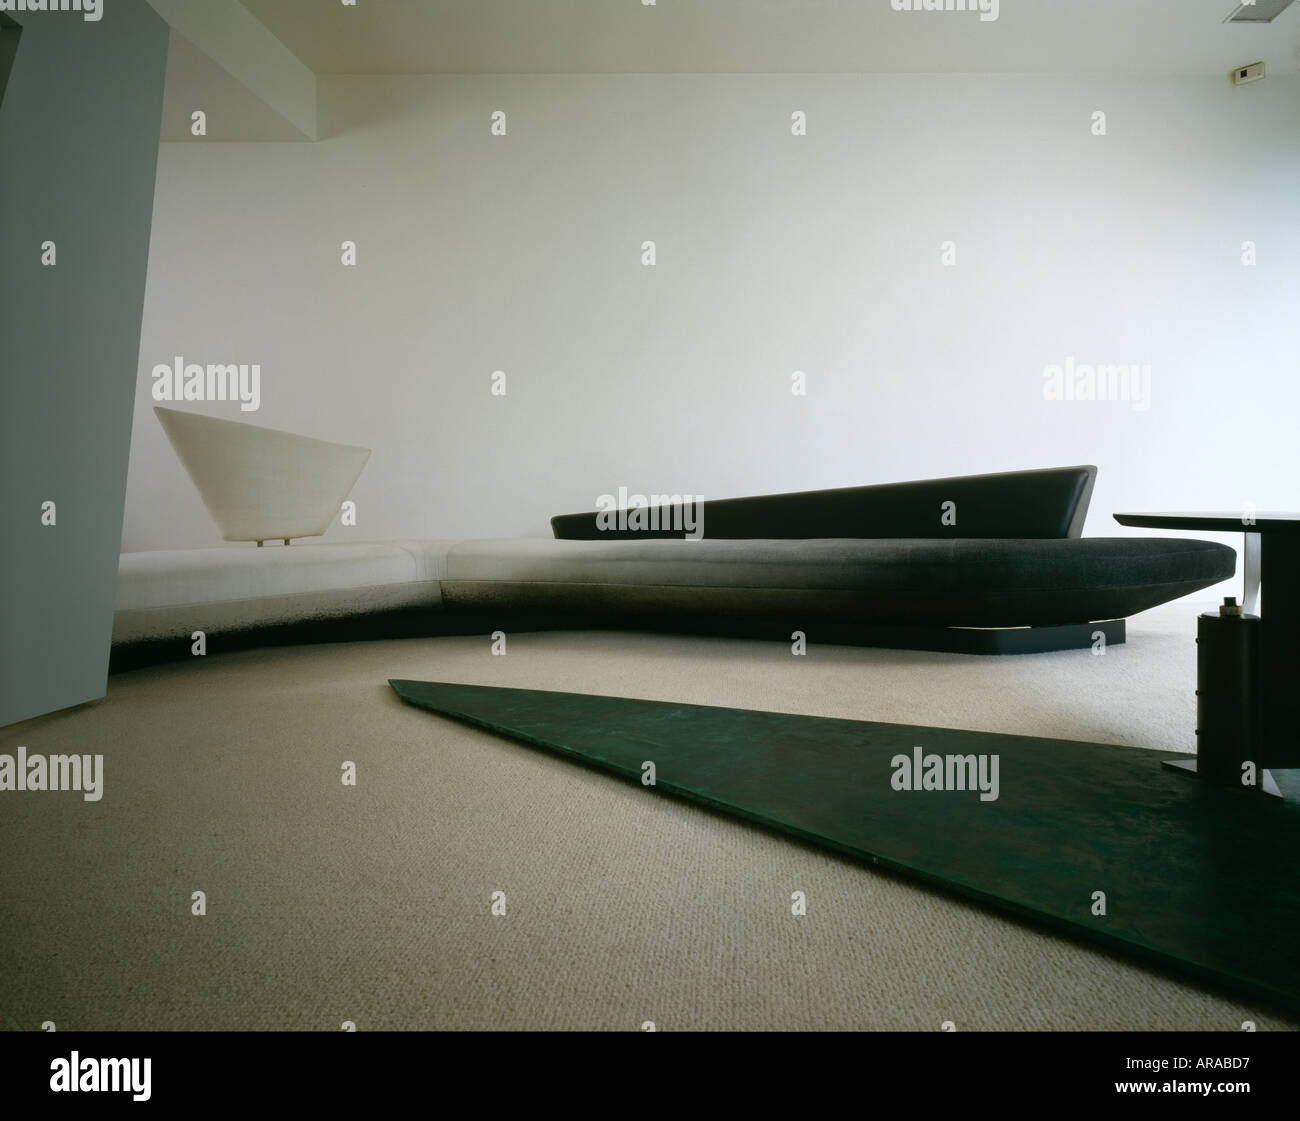 Zaha Hadid Designed Furniture At Cathcart Road. Architect: Zaha Hadid